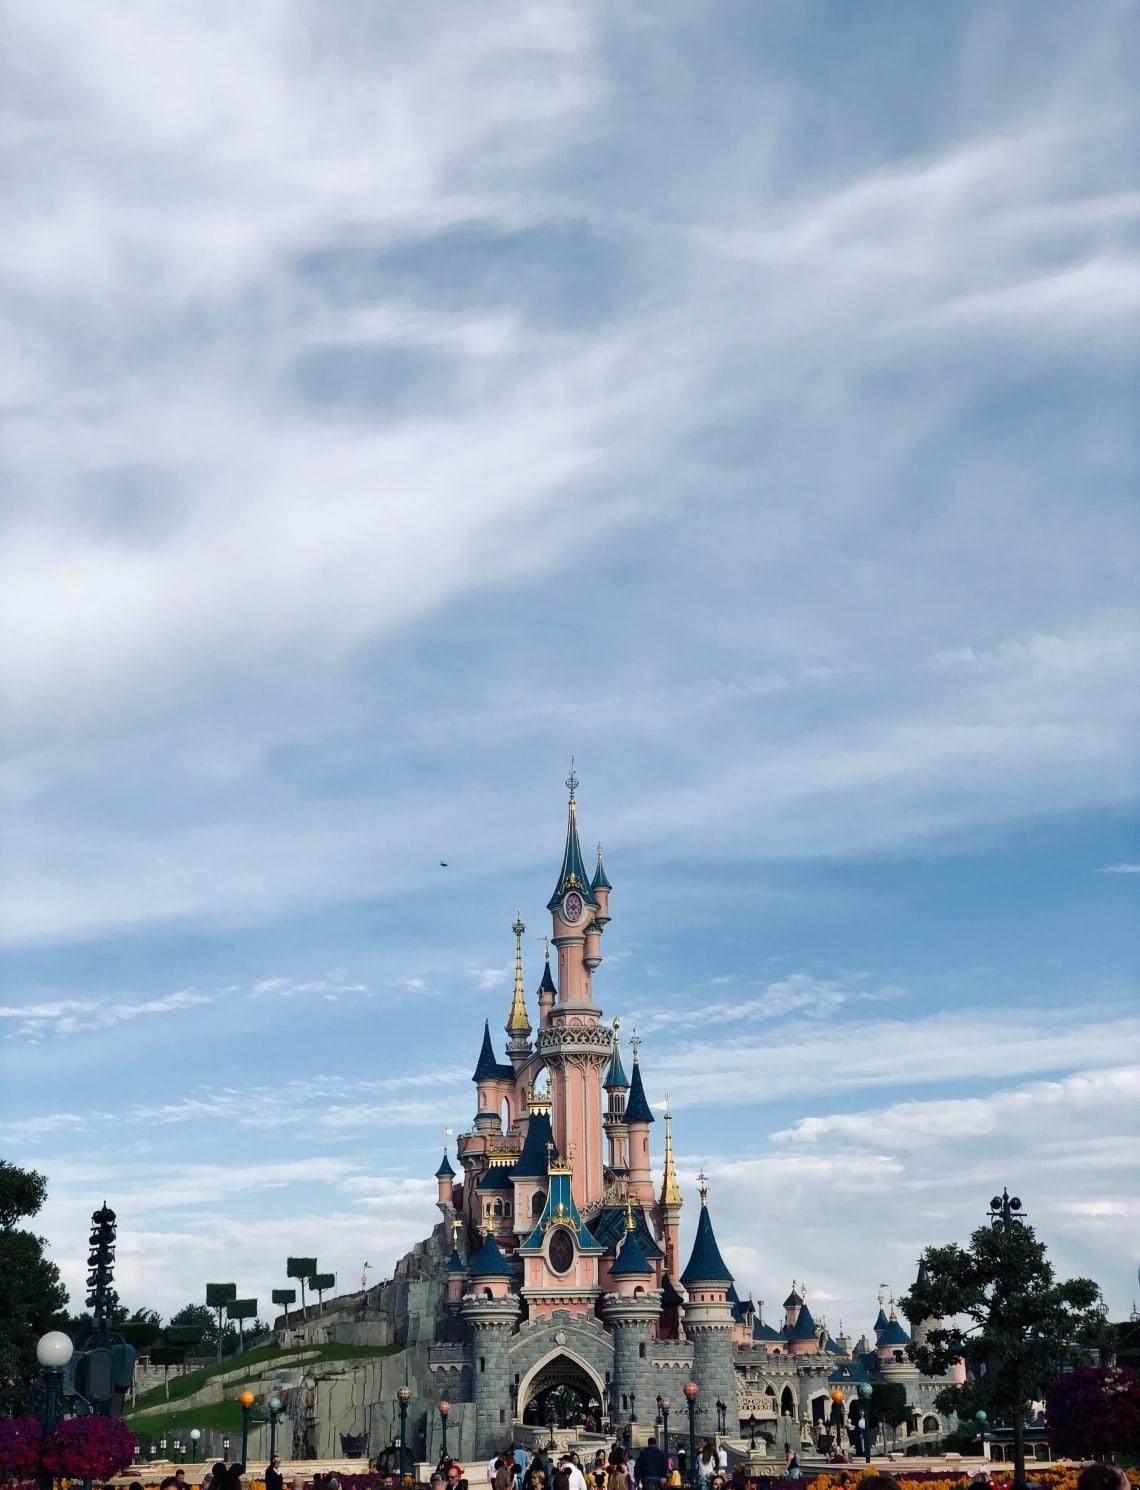 Disneyland, Paris, France